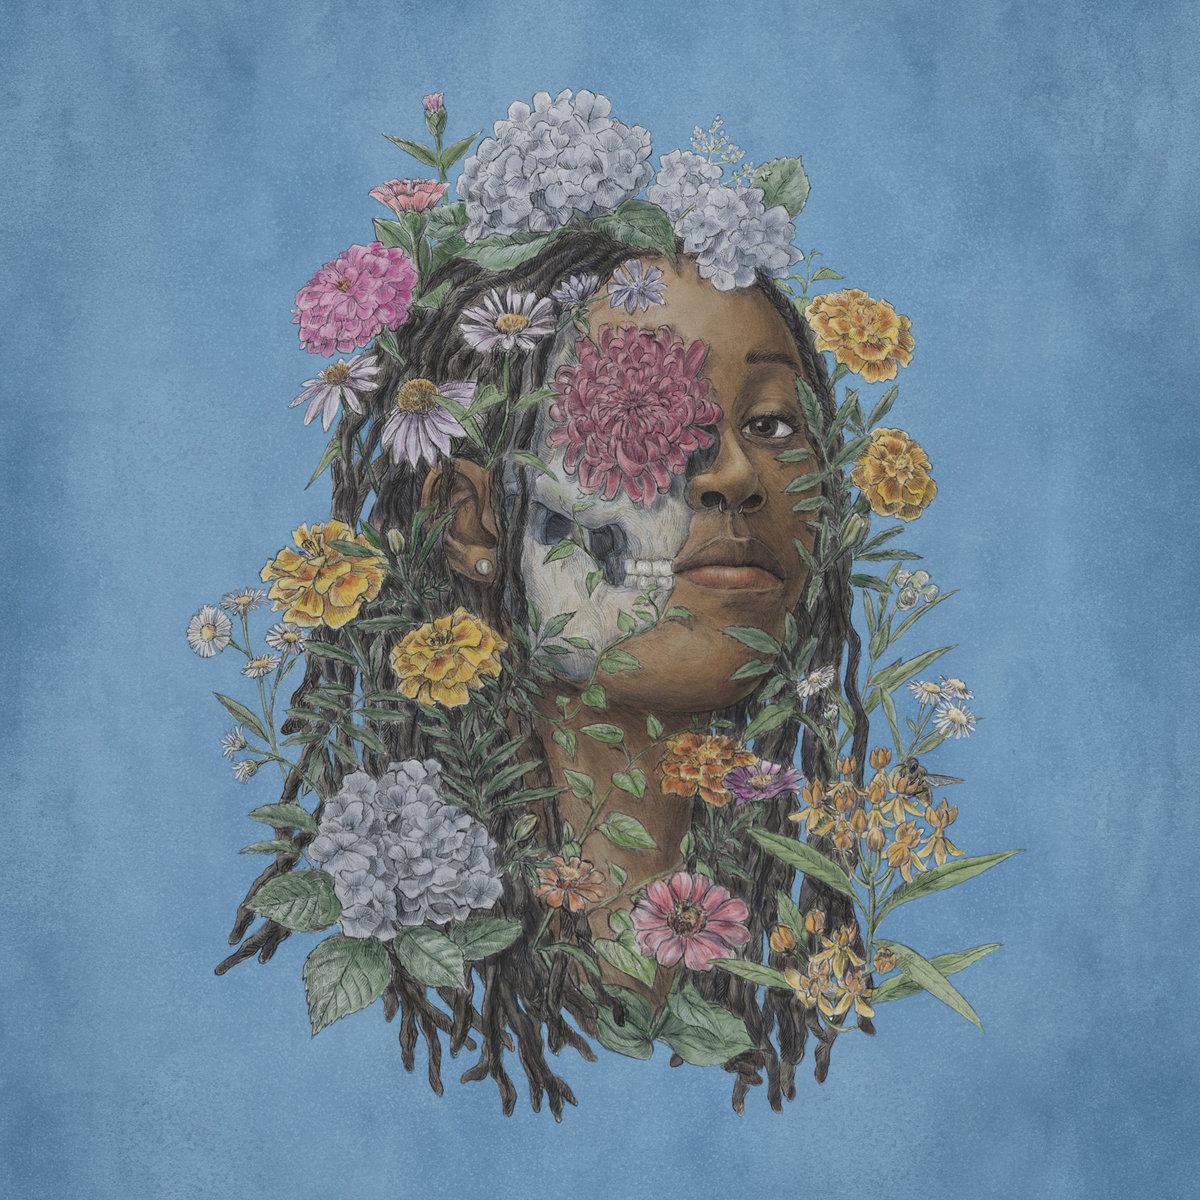 Overgrown by Ivy Sole - Maya Cassady '19